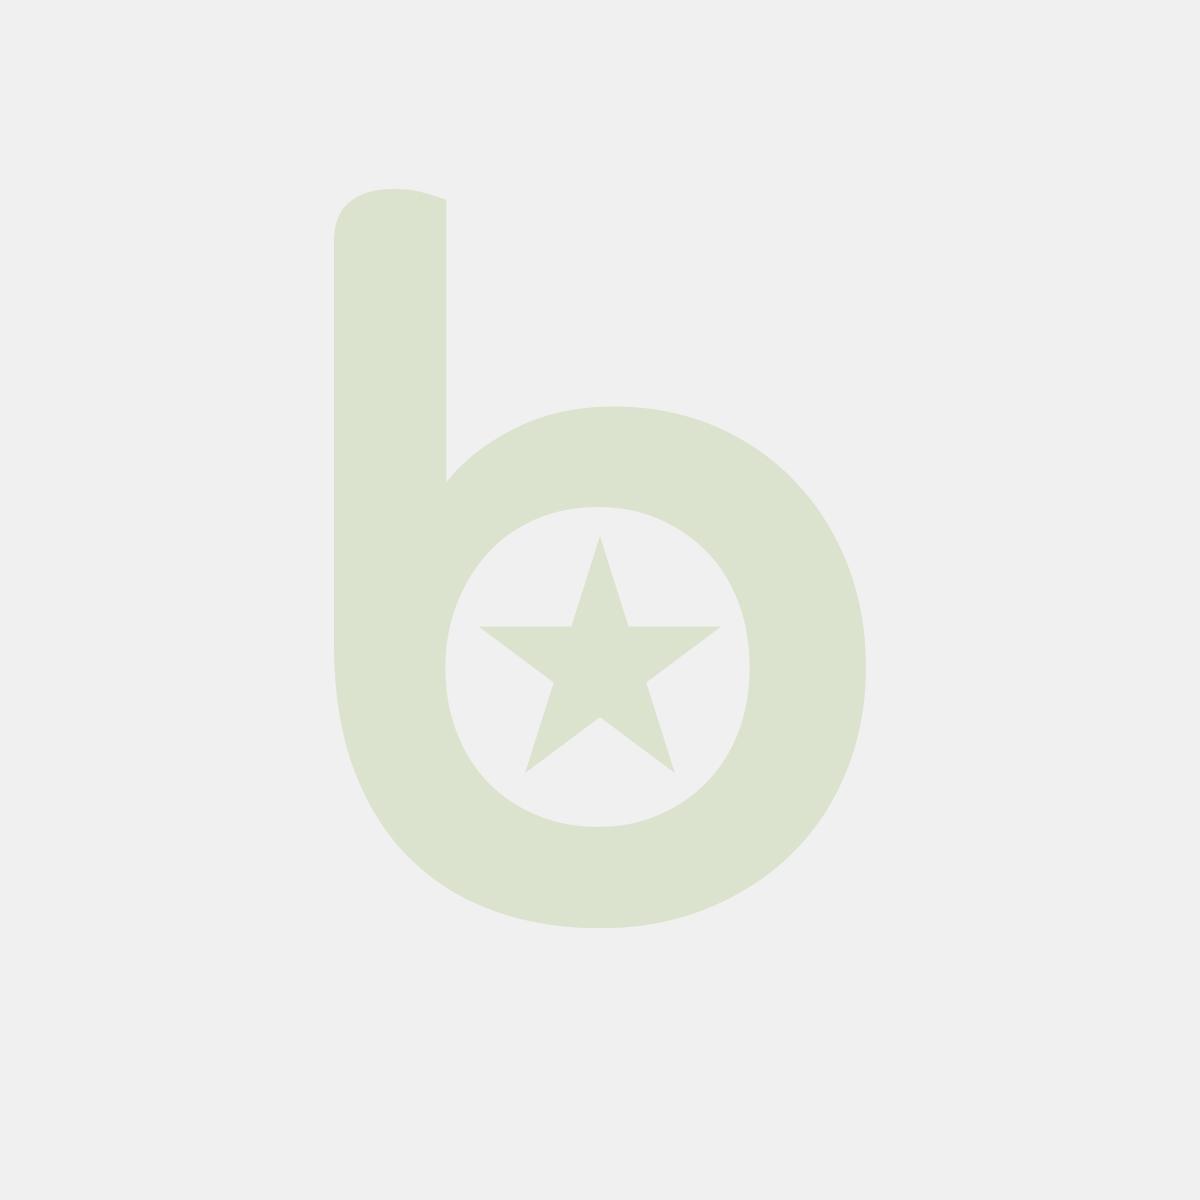 FINGERFOOD - brązowe skorupki jaj 50ml, fi.4,5x4,9cm, w opakowaniu PET op. 6 sztuk